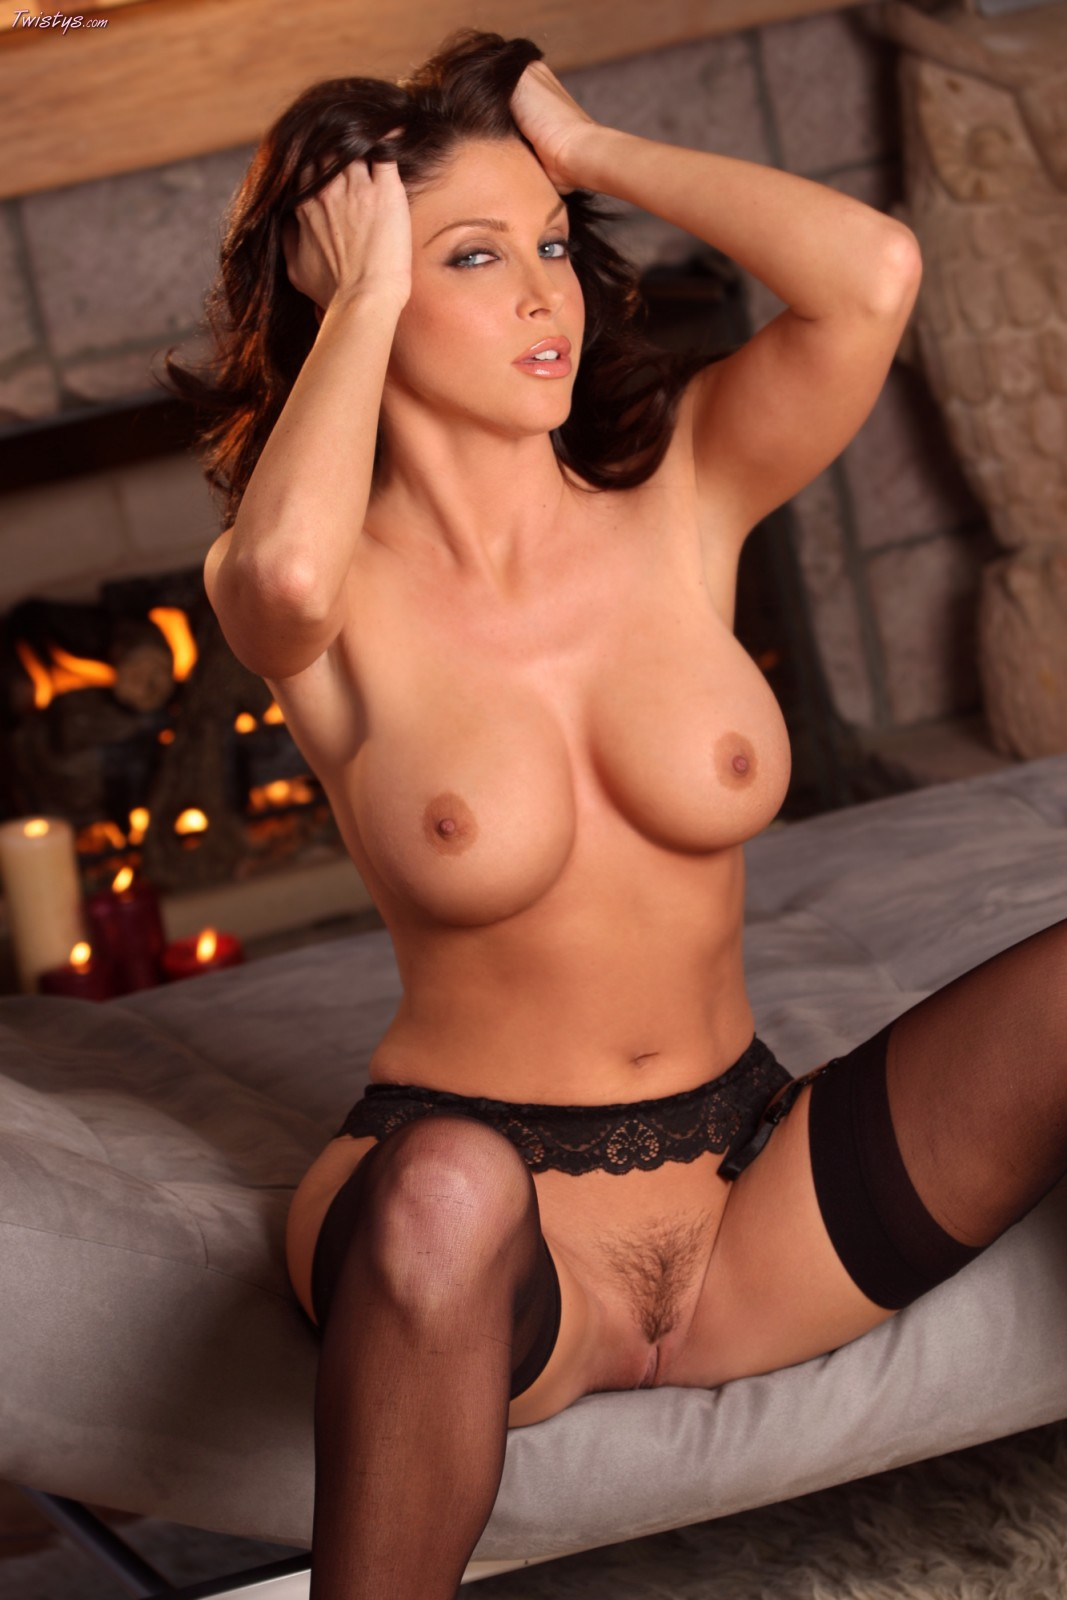 Erotic fashion shows